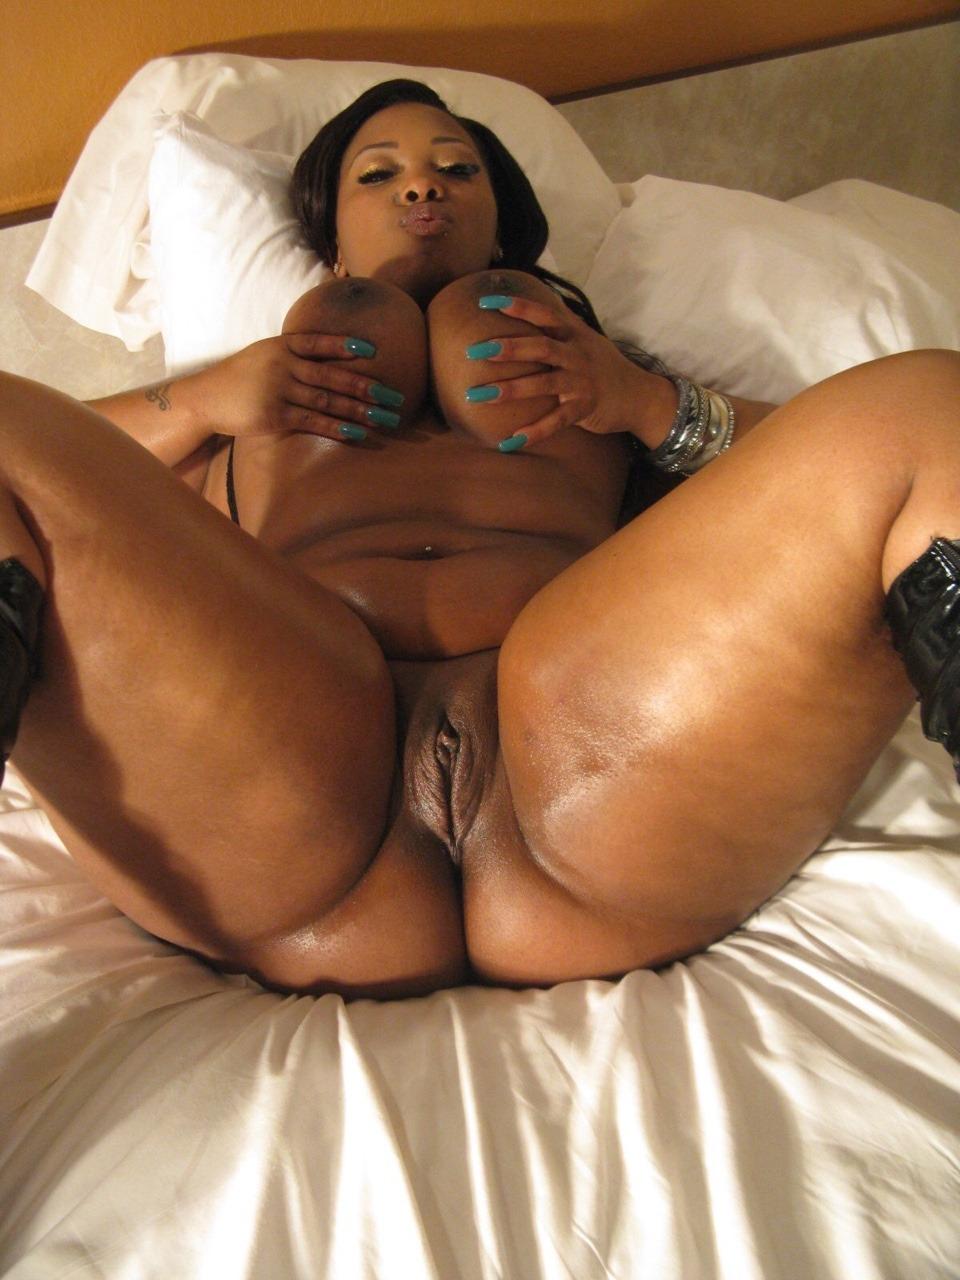 Black ebony sluts booty shaking music videos  nude black women black sexy ladies